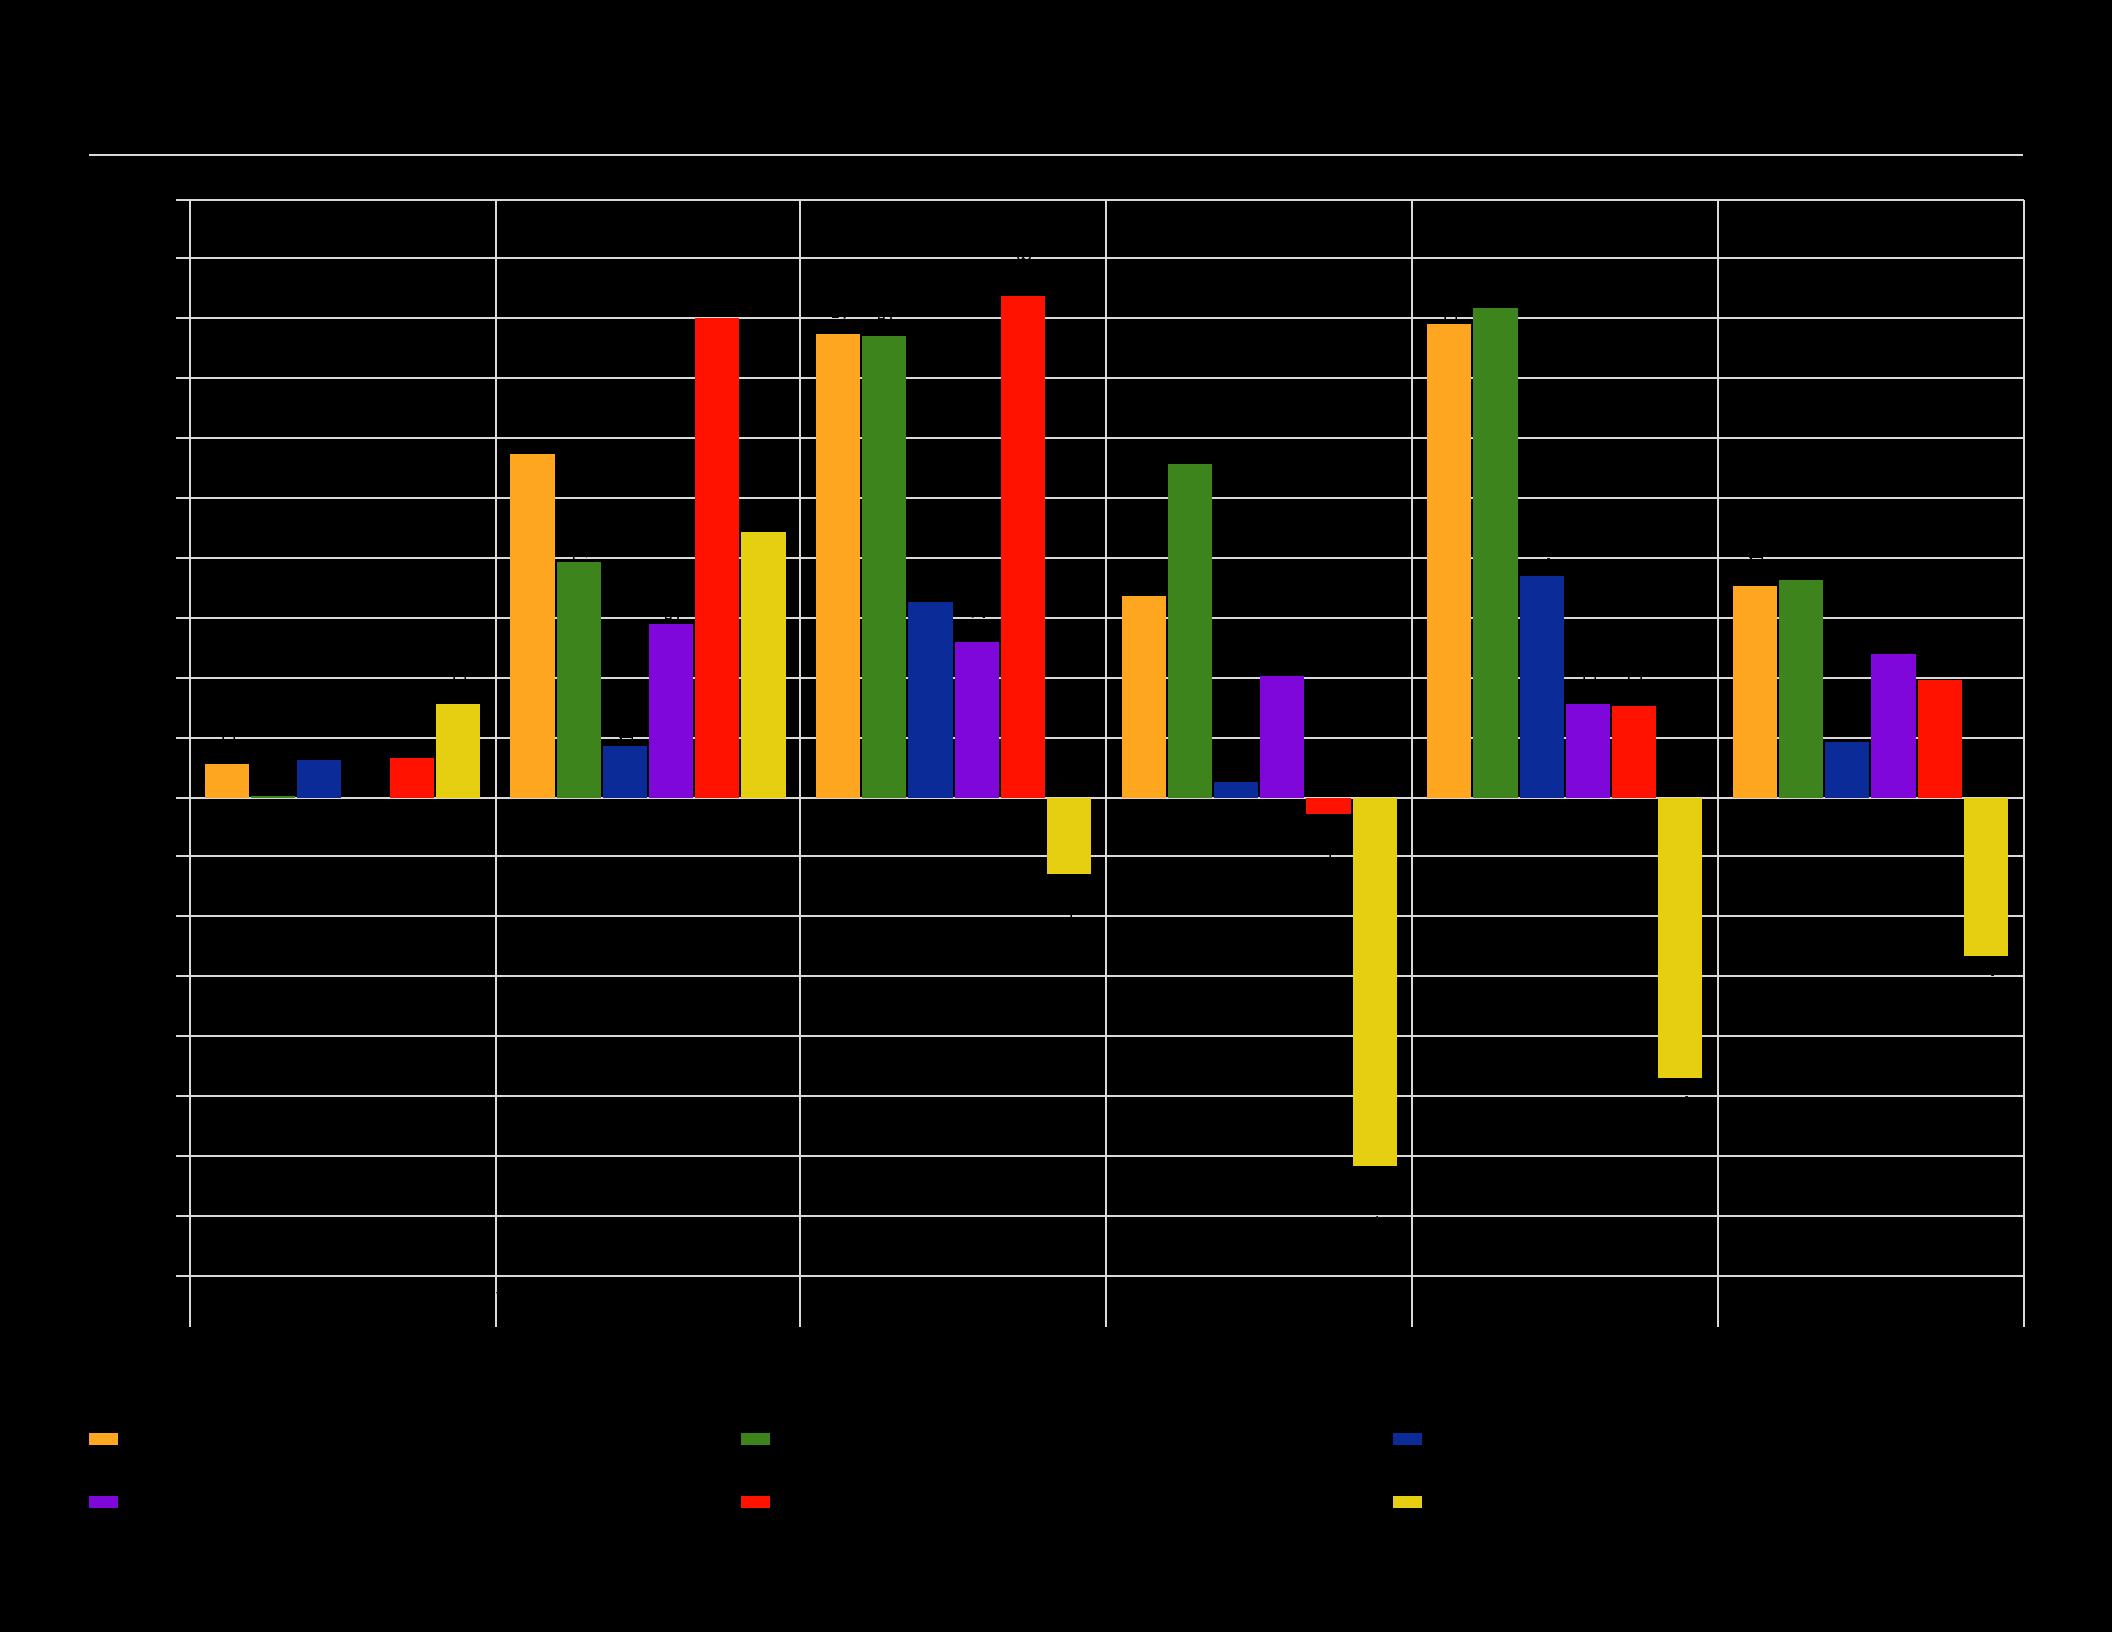 major asset class trailing returns graph as of 9/30/16 test